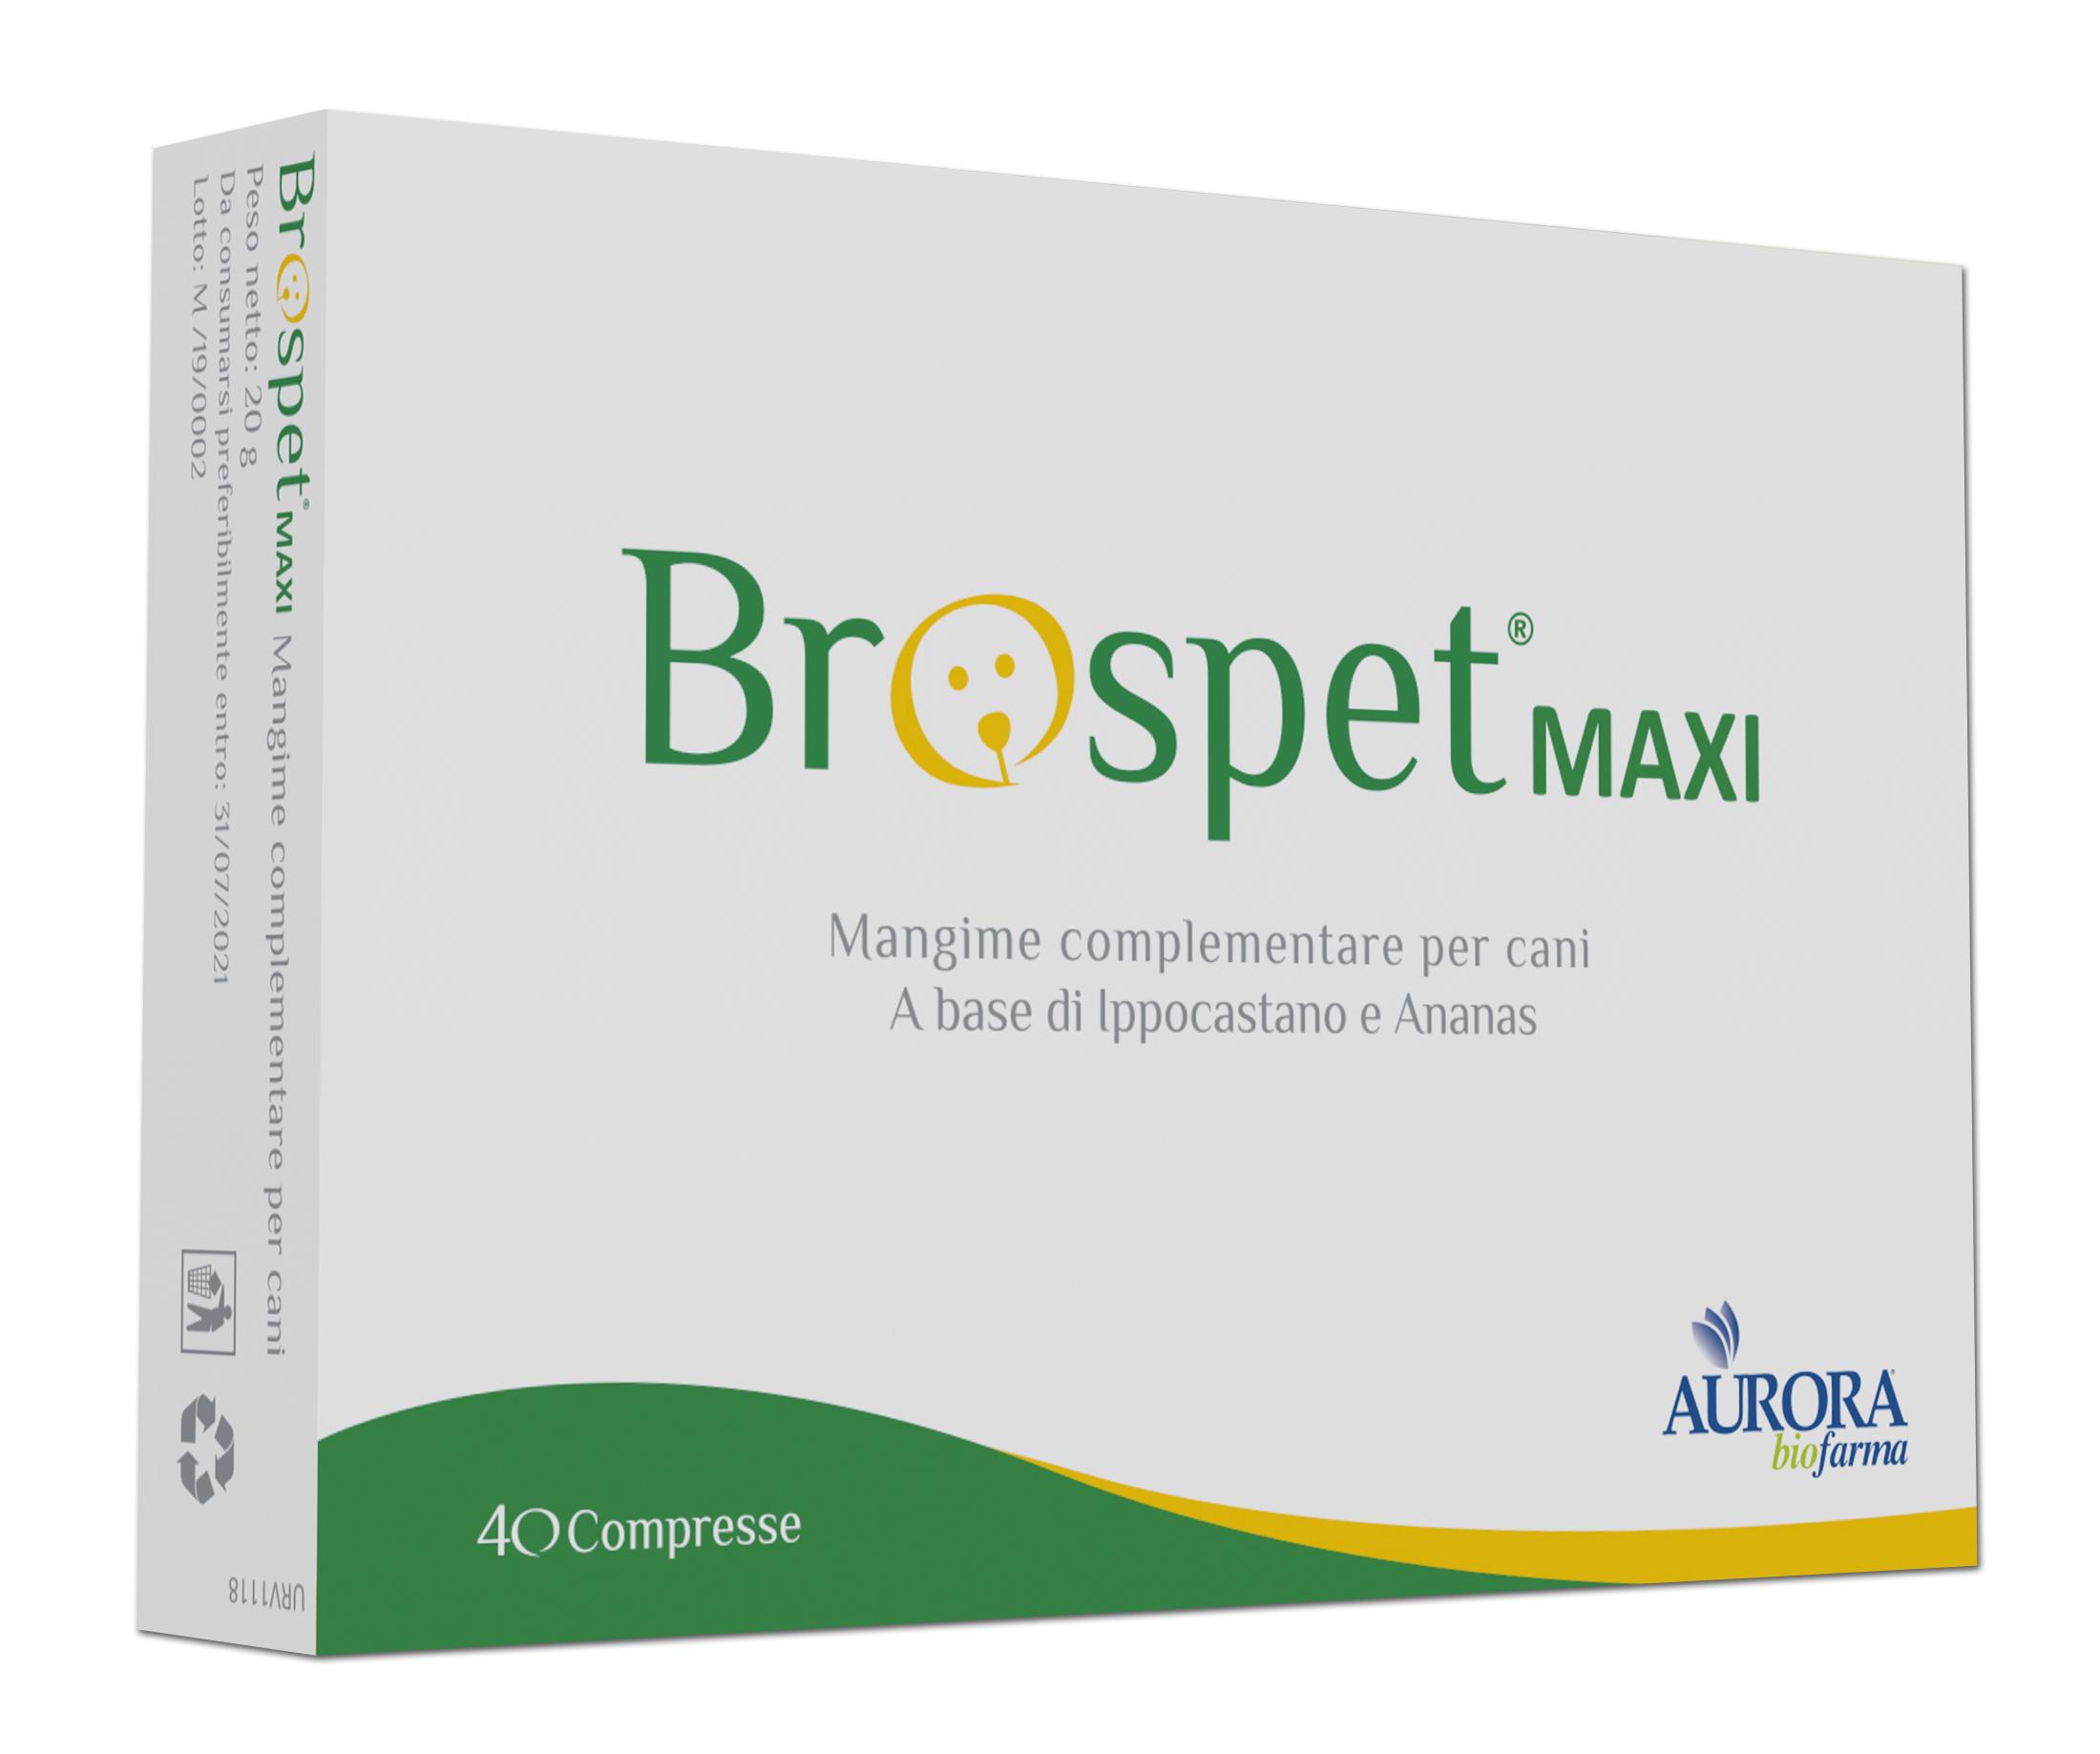 Image of Brospet Mangime Complementare Per Cani Formato Maxi 40 Comprese 971270210